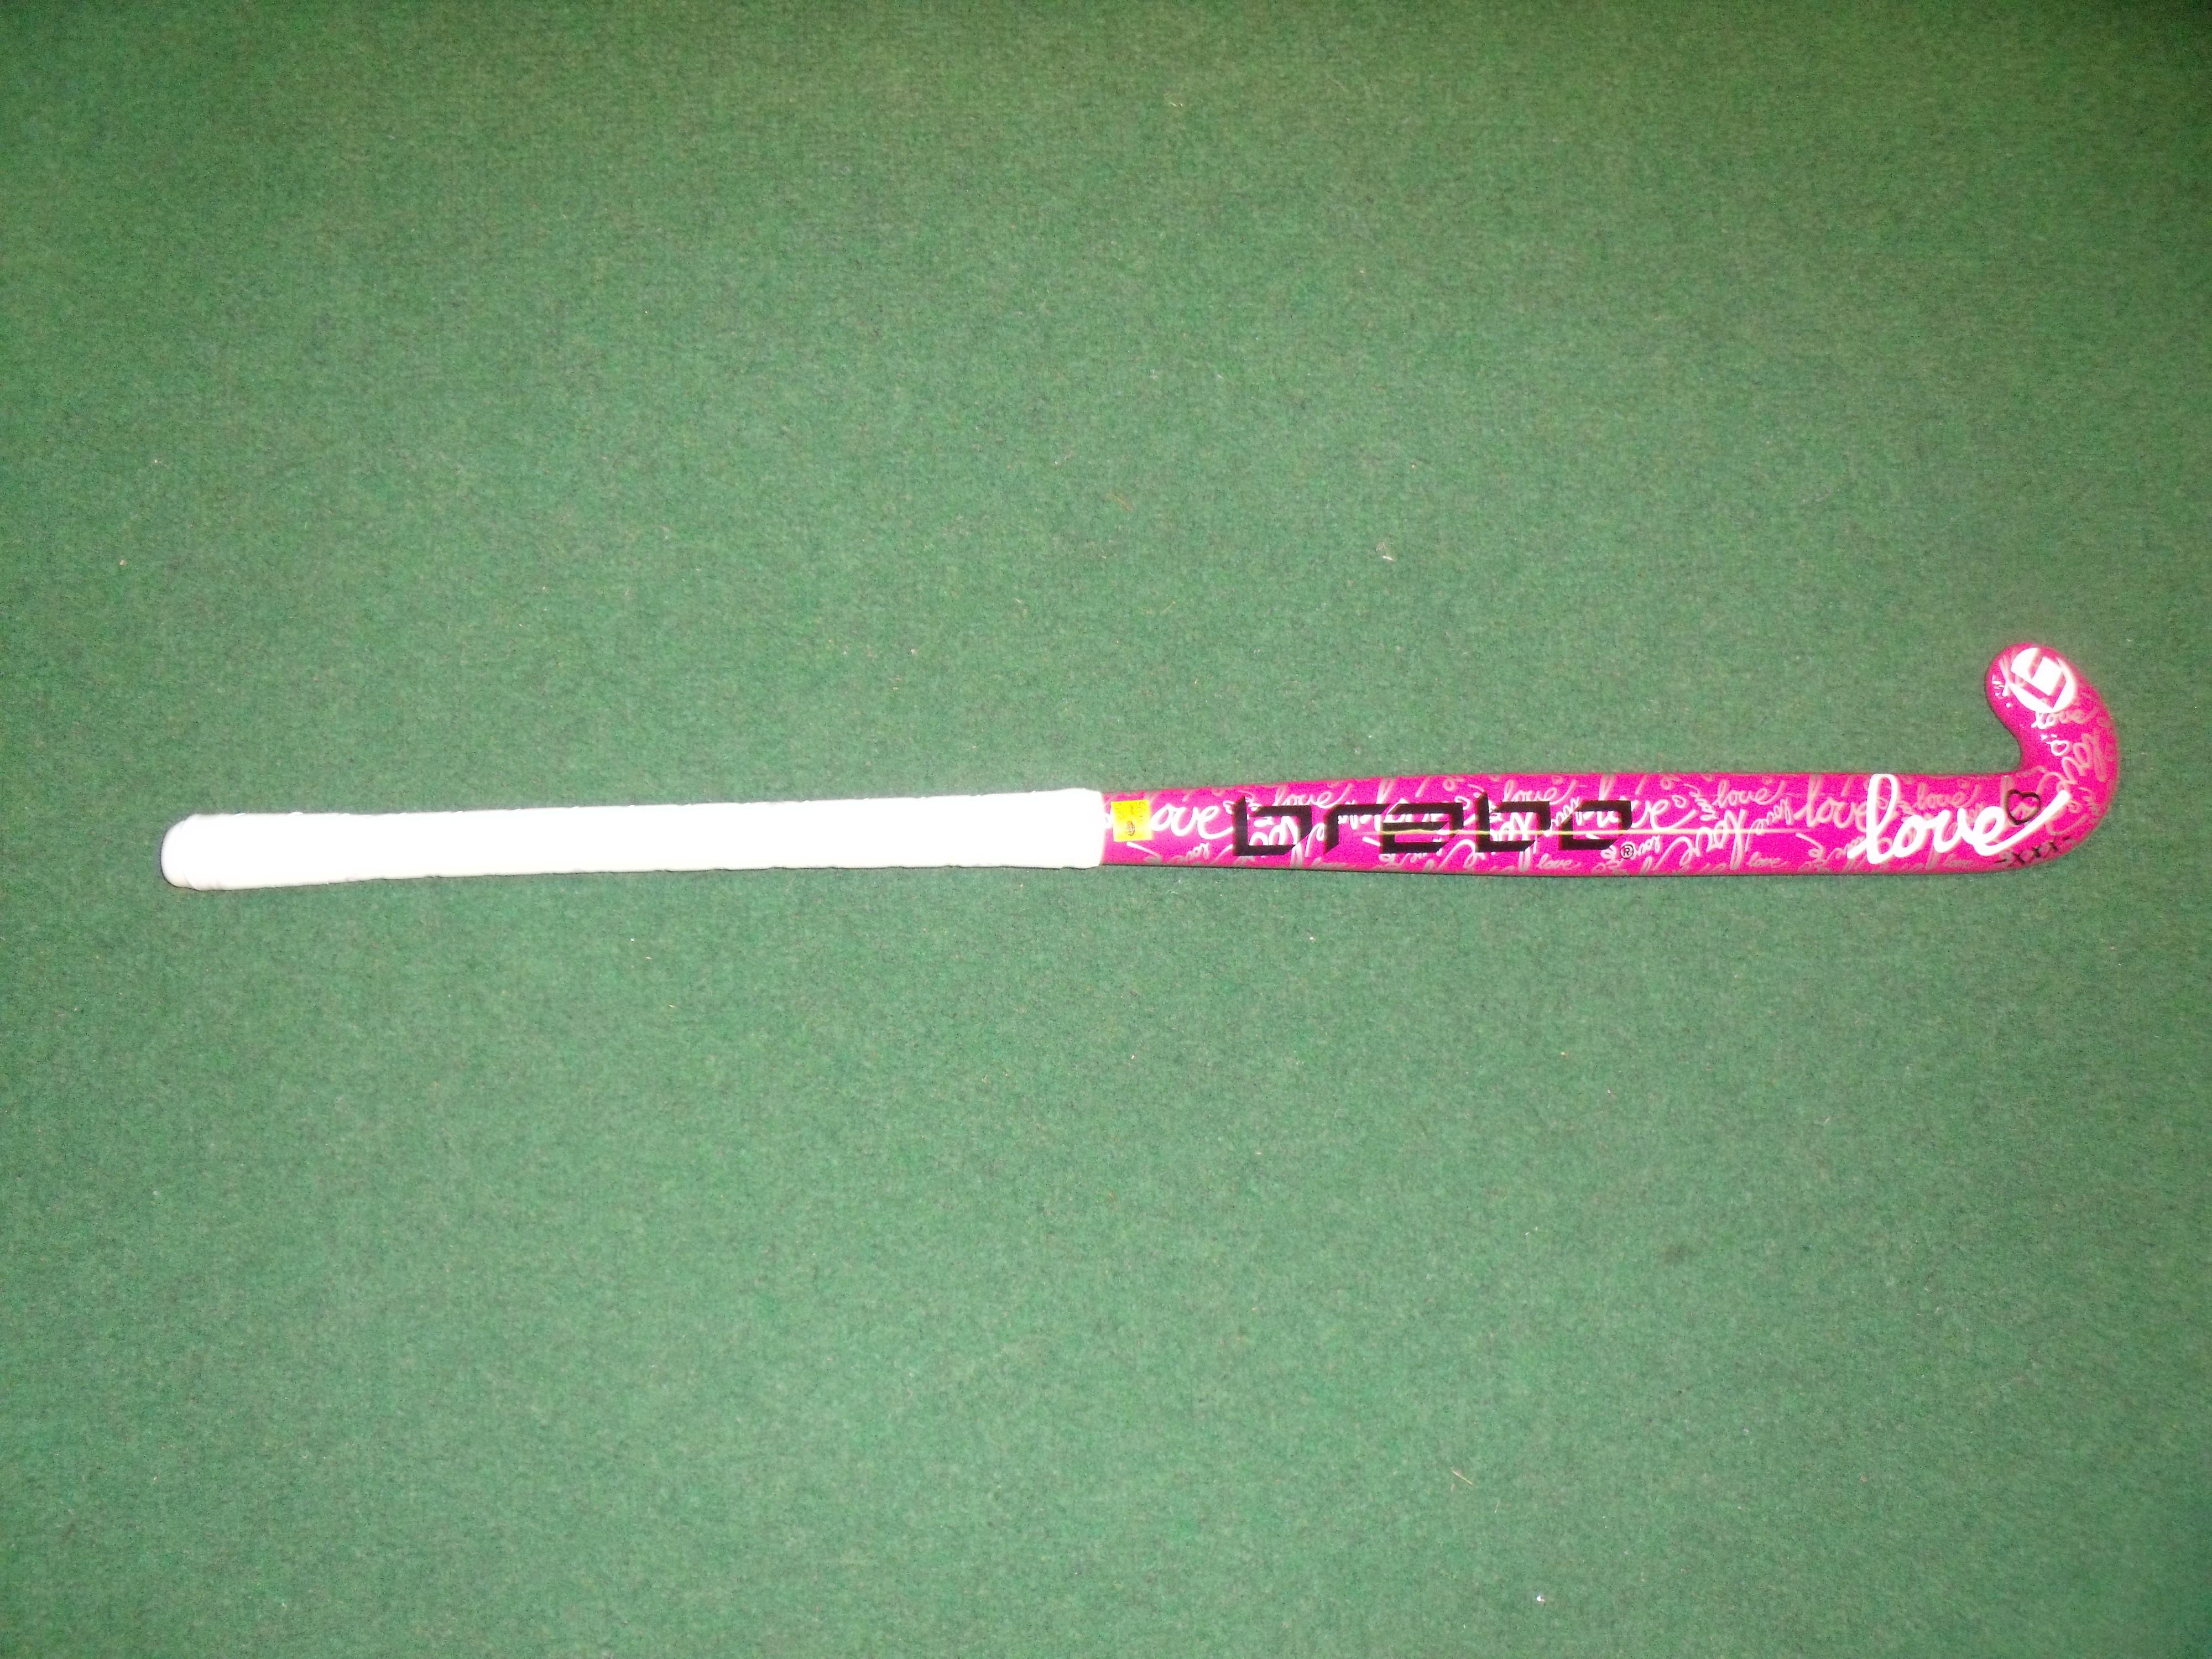 BRABO hockeystick love (355)